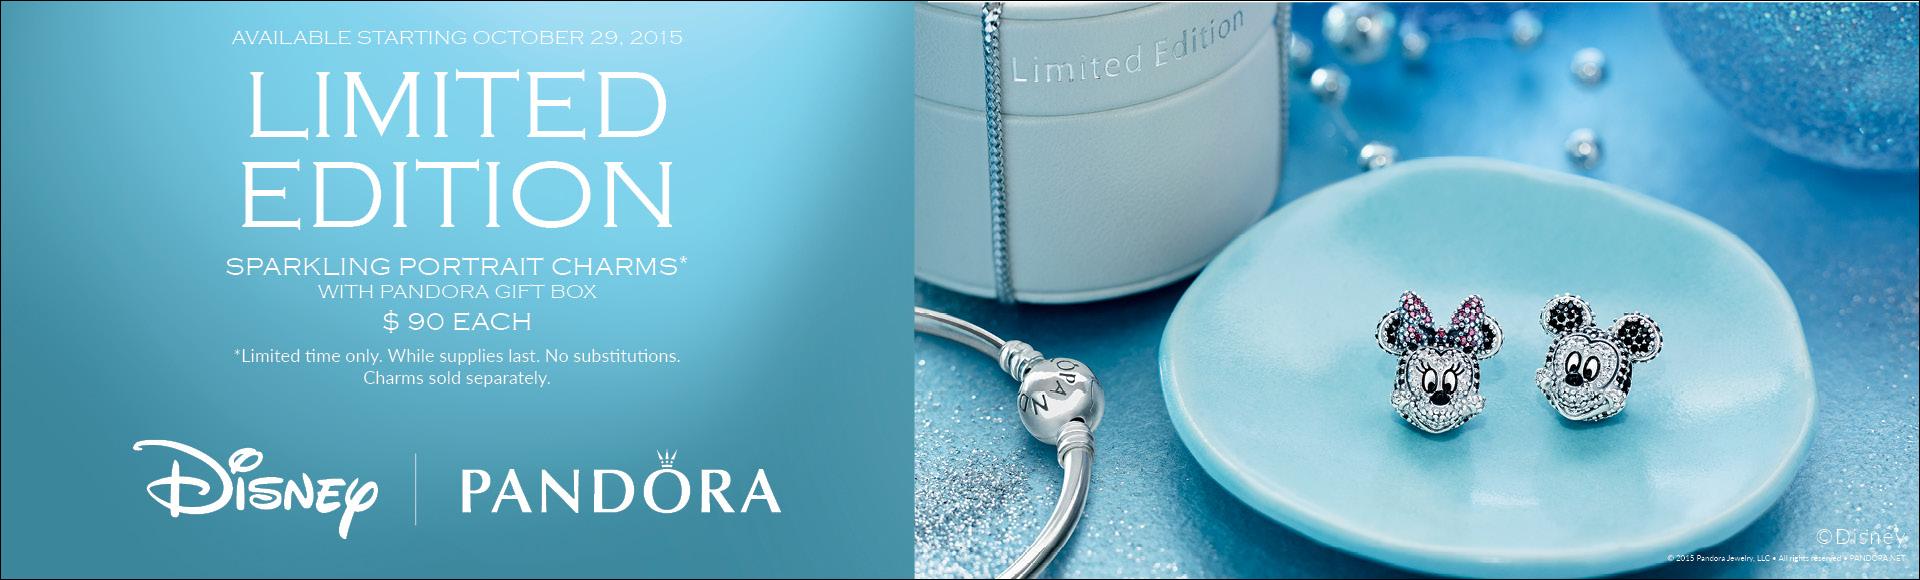 Pandora Disney Limited Edition Charms